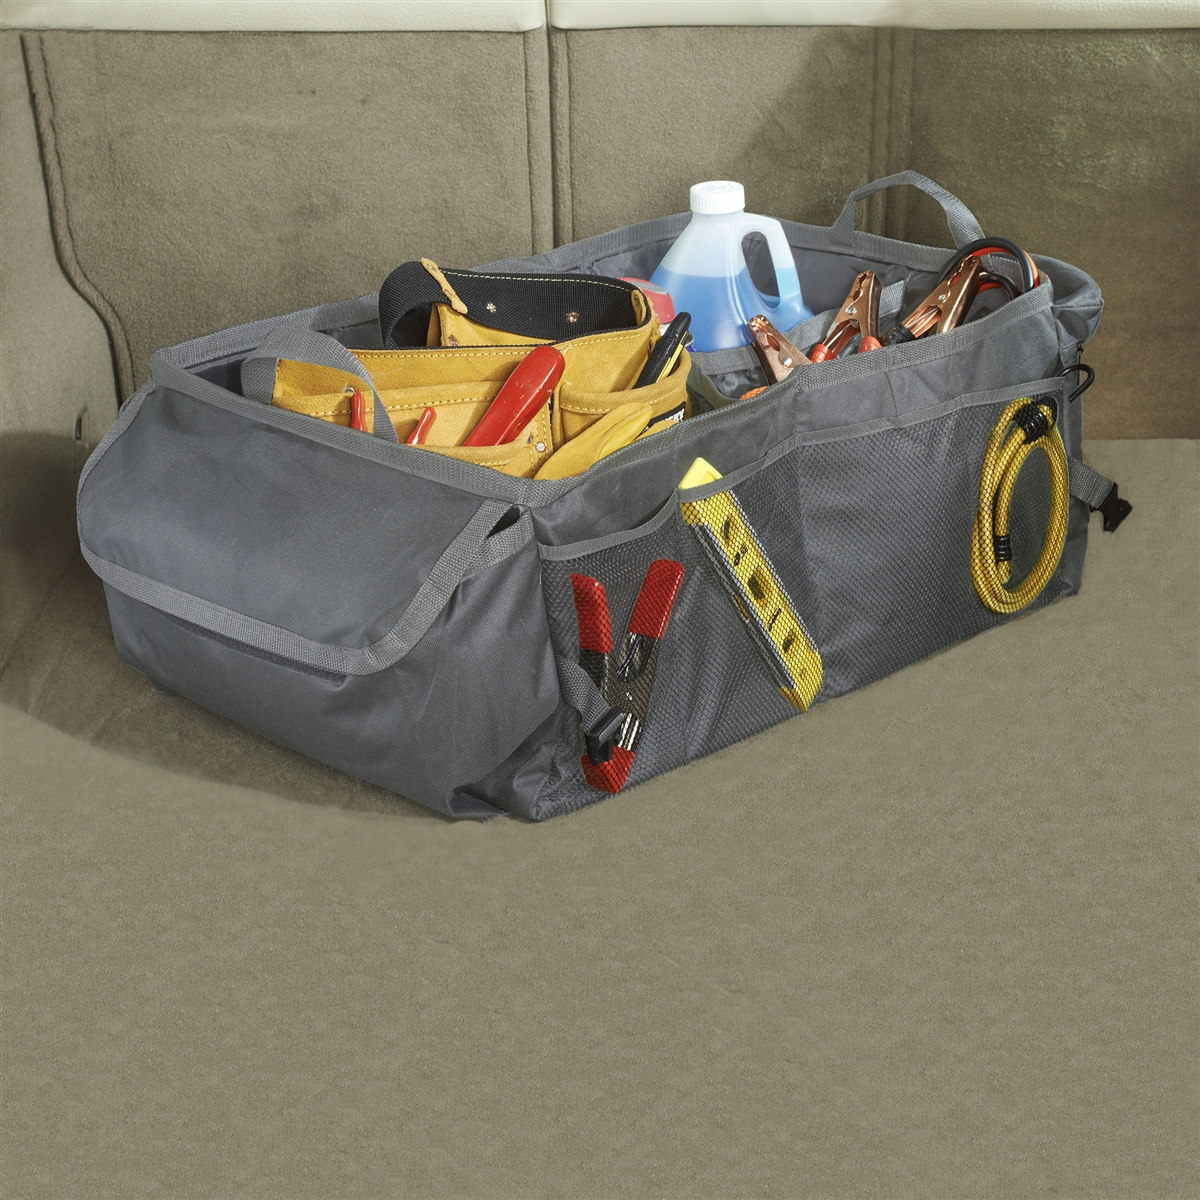 RYANSTAR RACING Multi-Purpose Baggage Storage Racks Cargo Blocks Trunk Organizer for Trunk Car SUV Van Set of 4